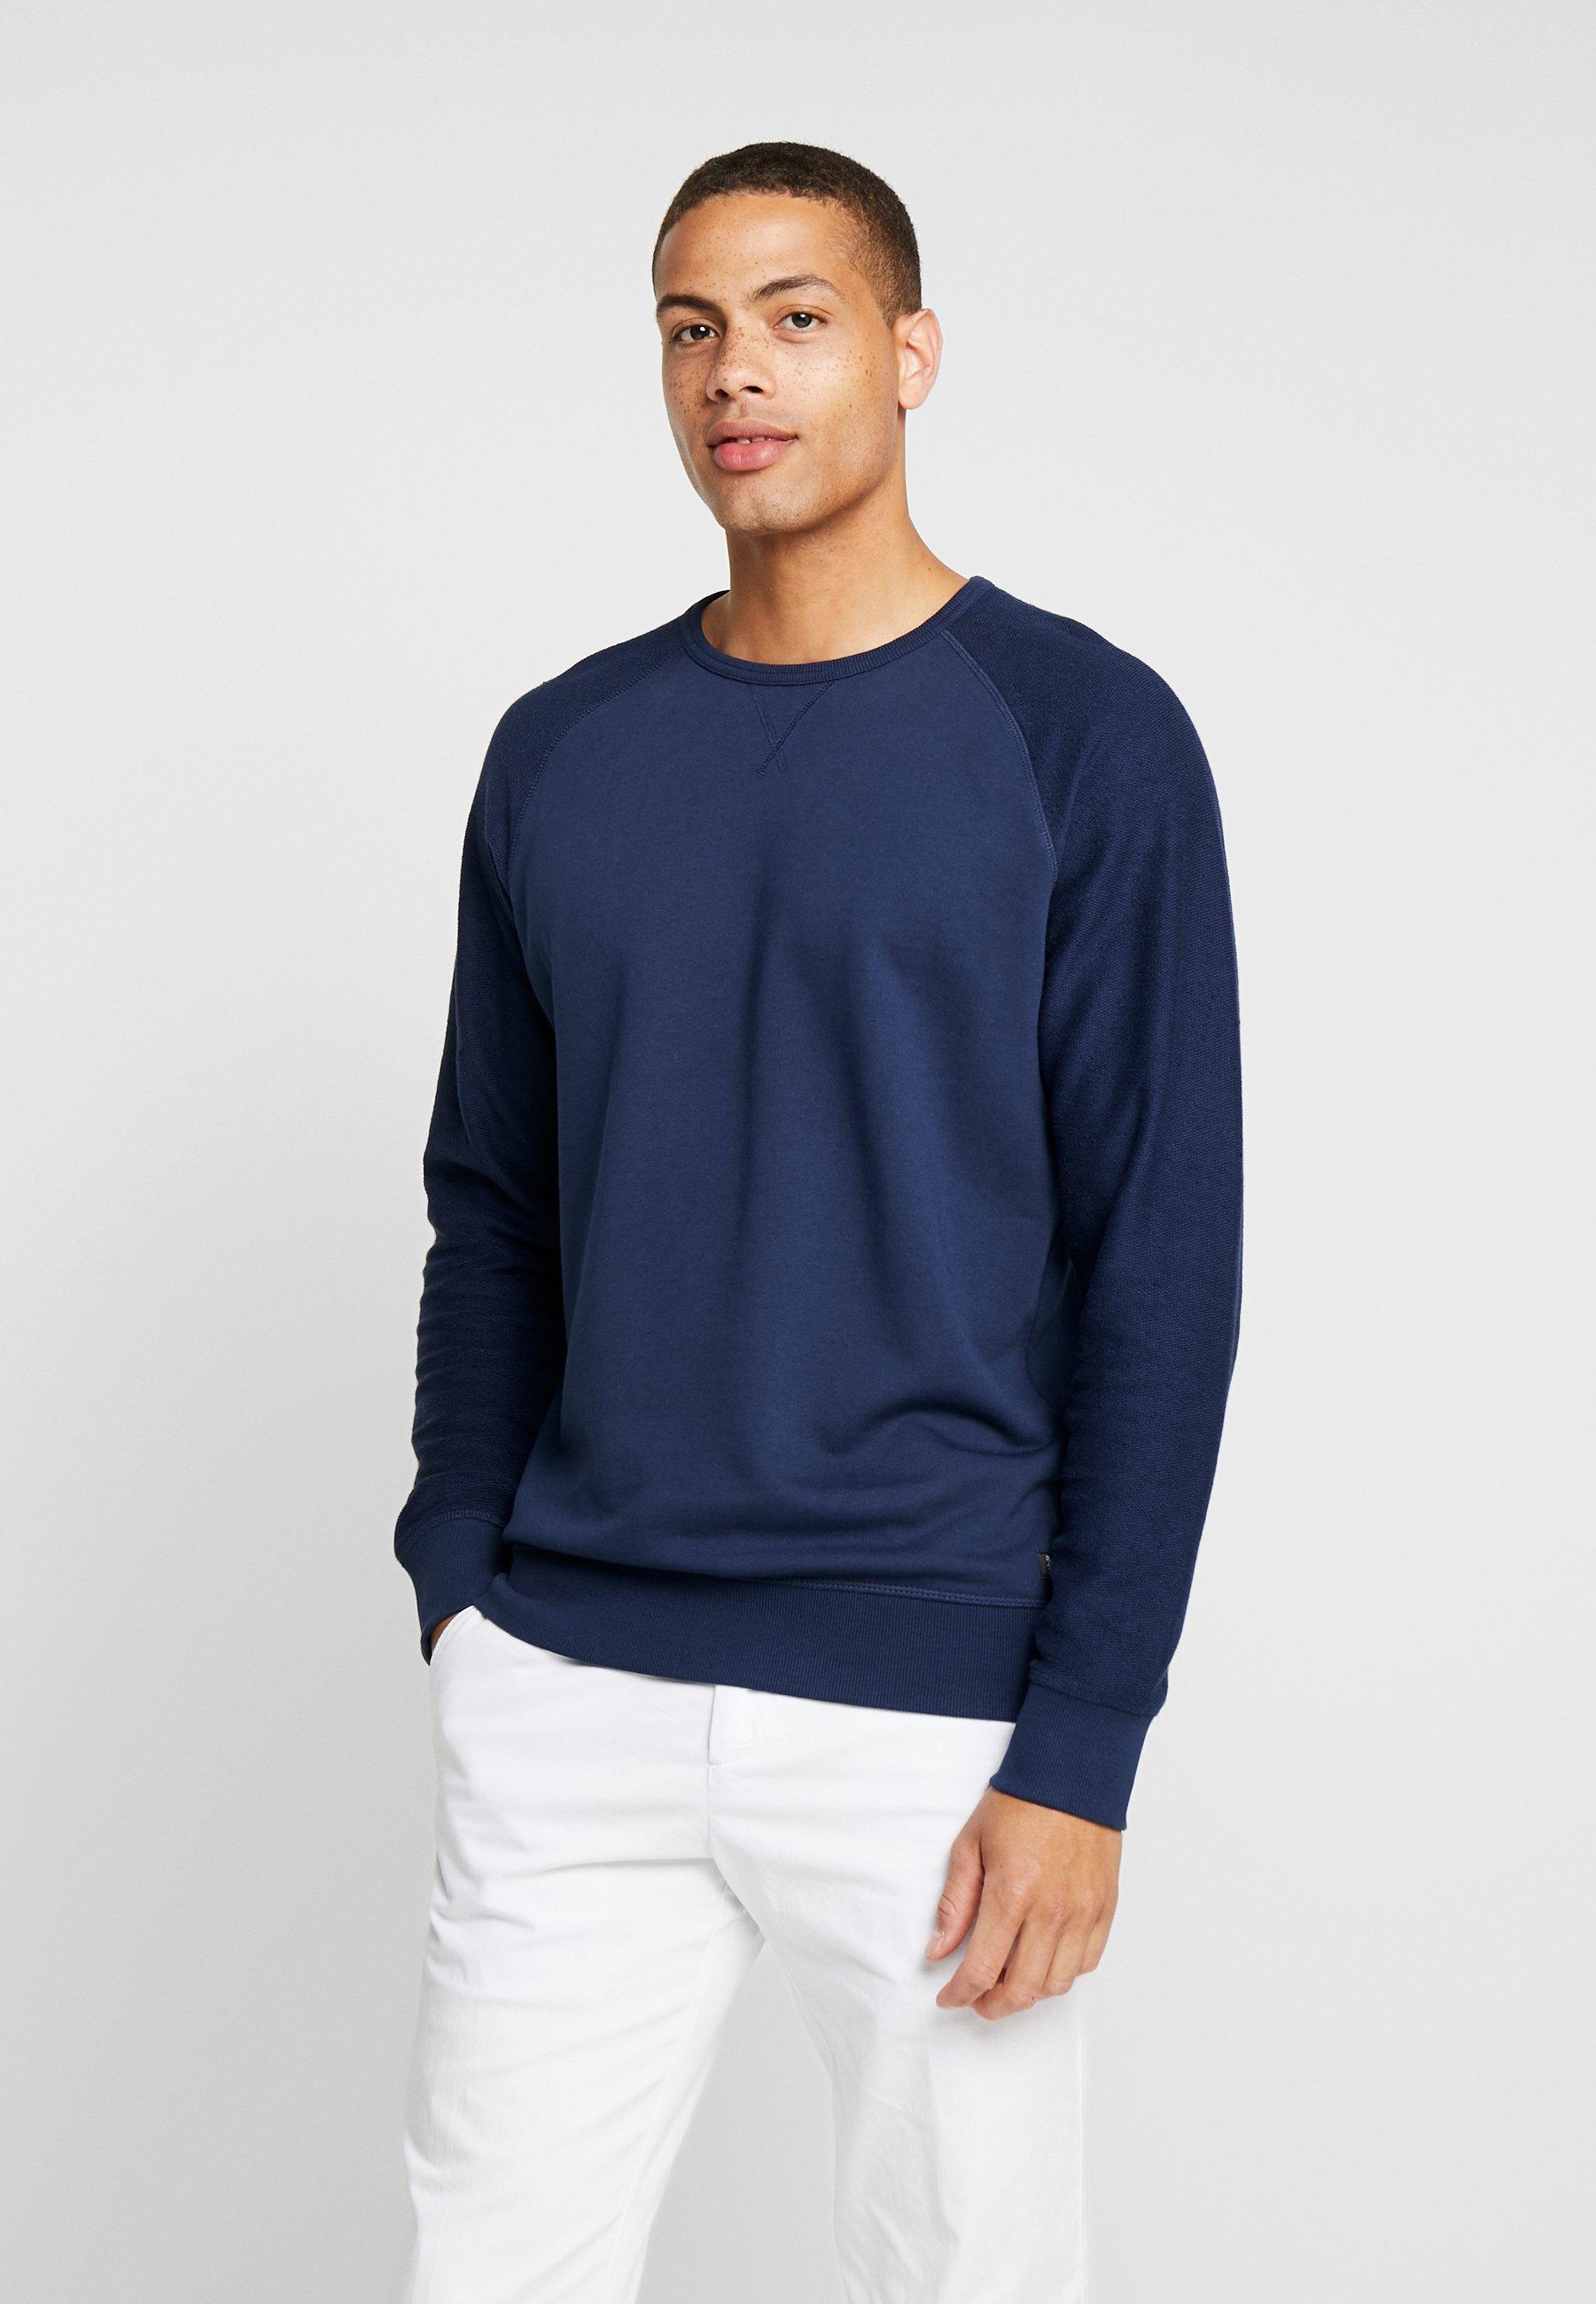 Tom Structured Agate Denim SleevesSweatshirt Tailor Stone Blue Crewneck 3jA4qc5RSL